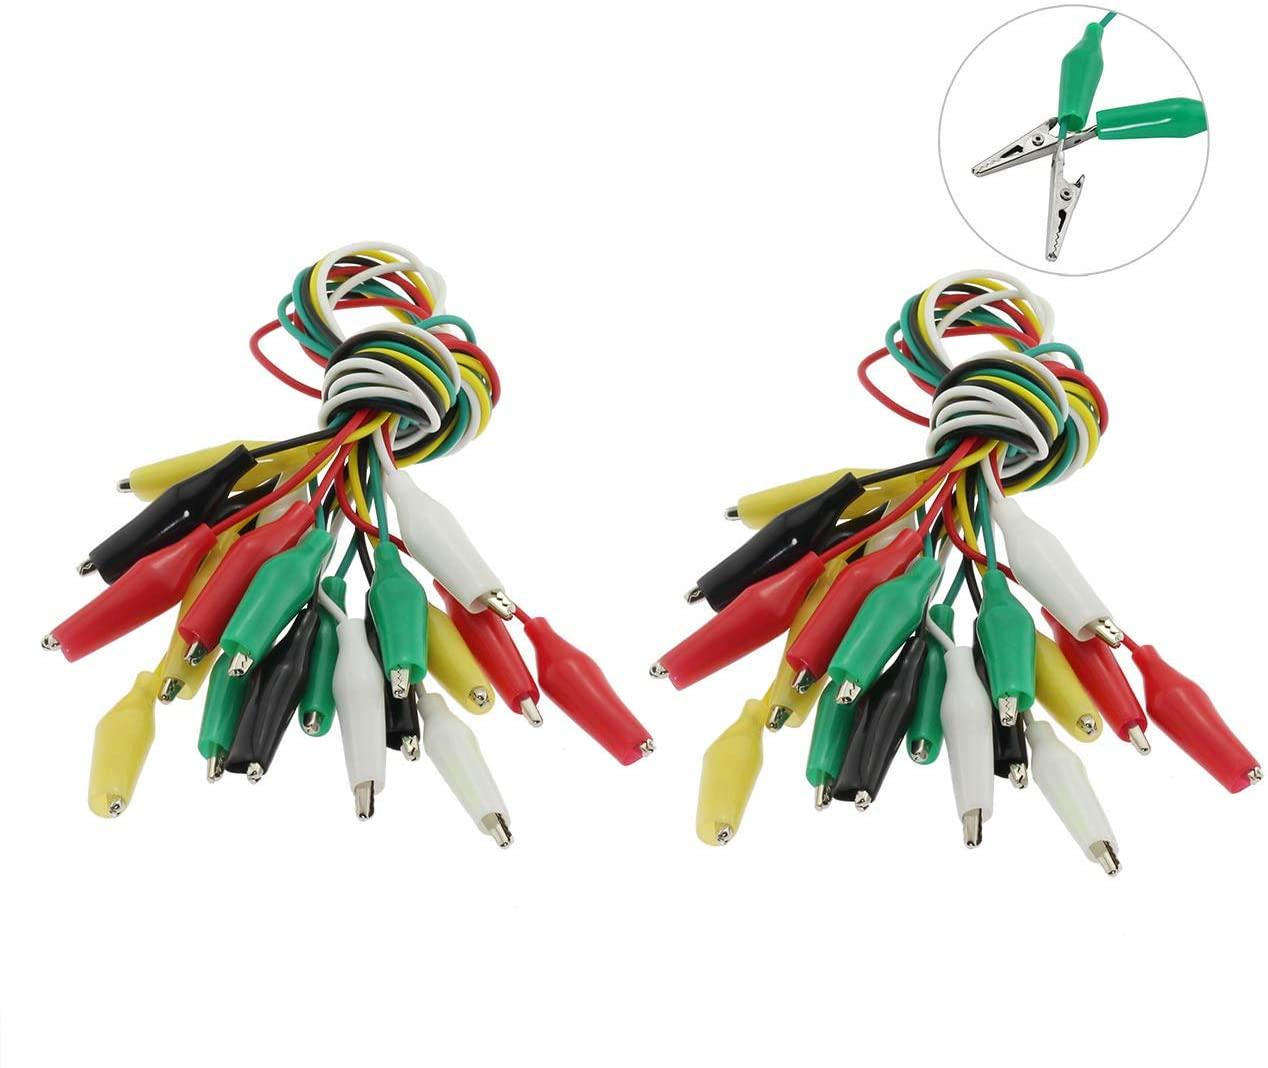 ZRM&E 20PCS 50cm Alligator Clip Wire M Size Double-Ended Crocodile Clip Test Jumper Wire Test Lead Line 5 Colors for Electrical DIY Test Cable